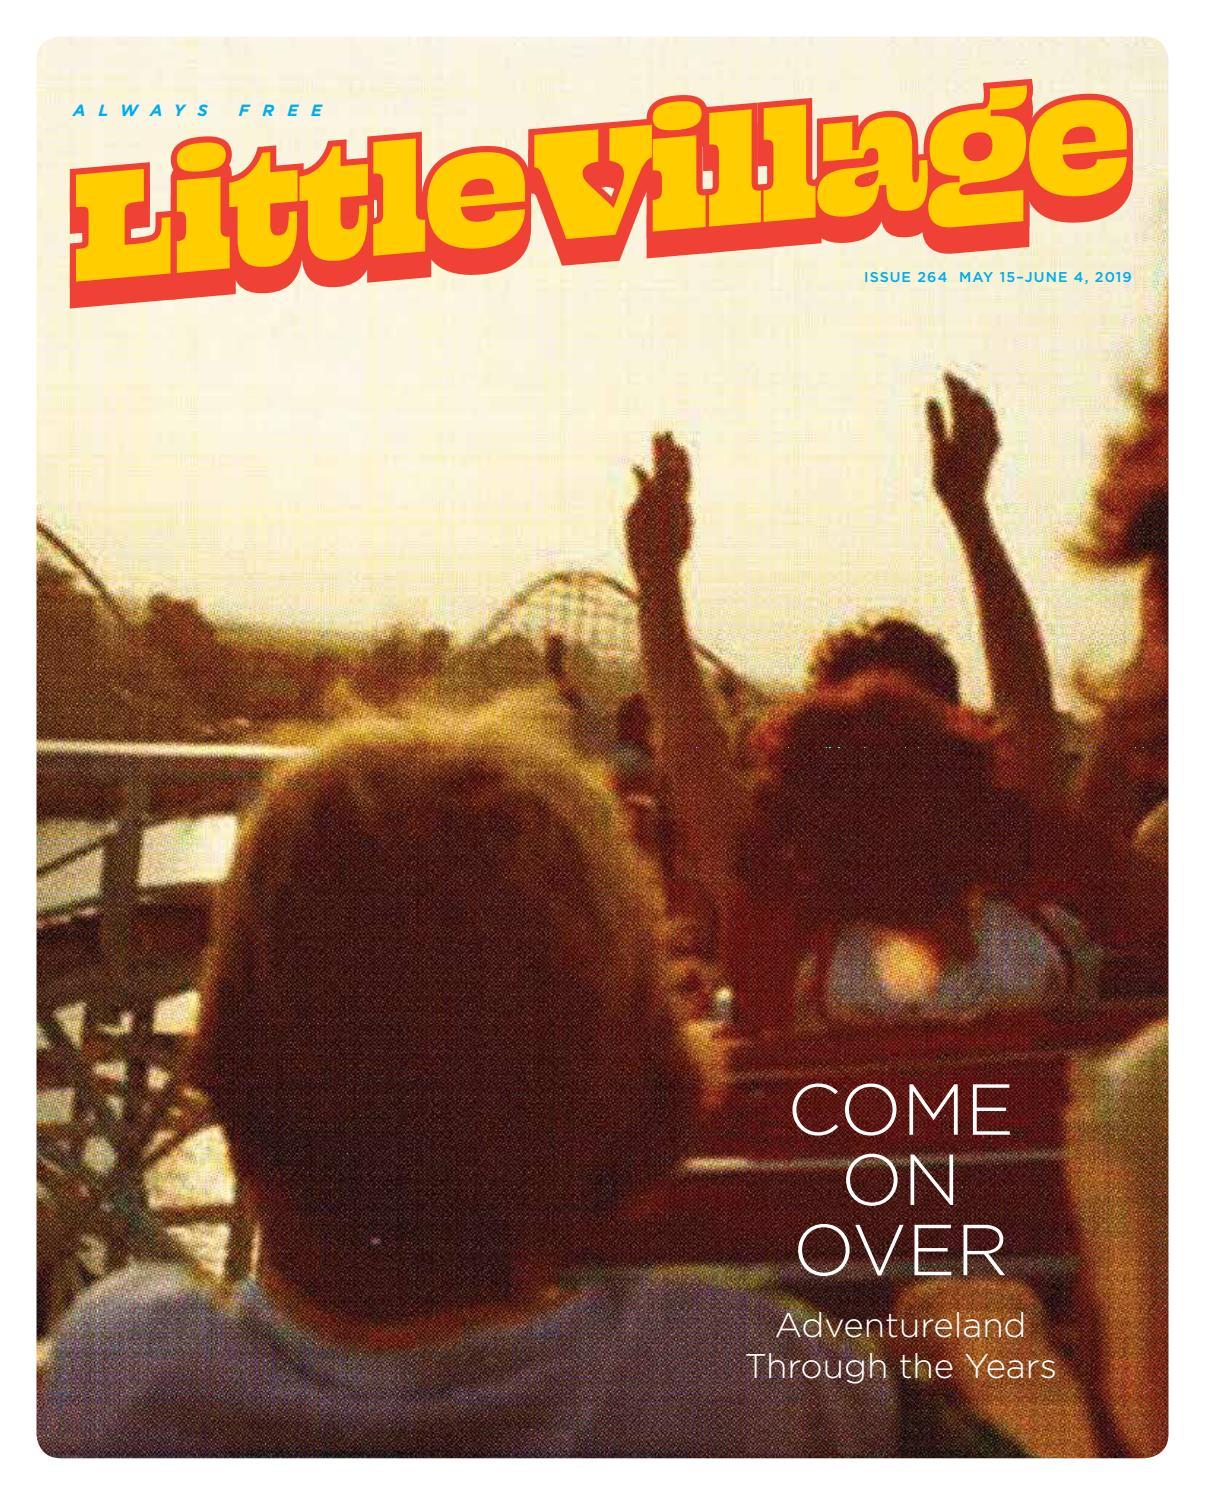 Little Village issue 264 - May 15 - June 4, 2019 by Little Village